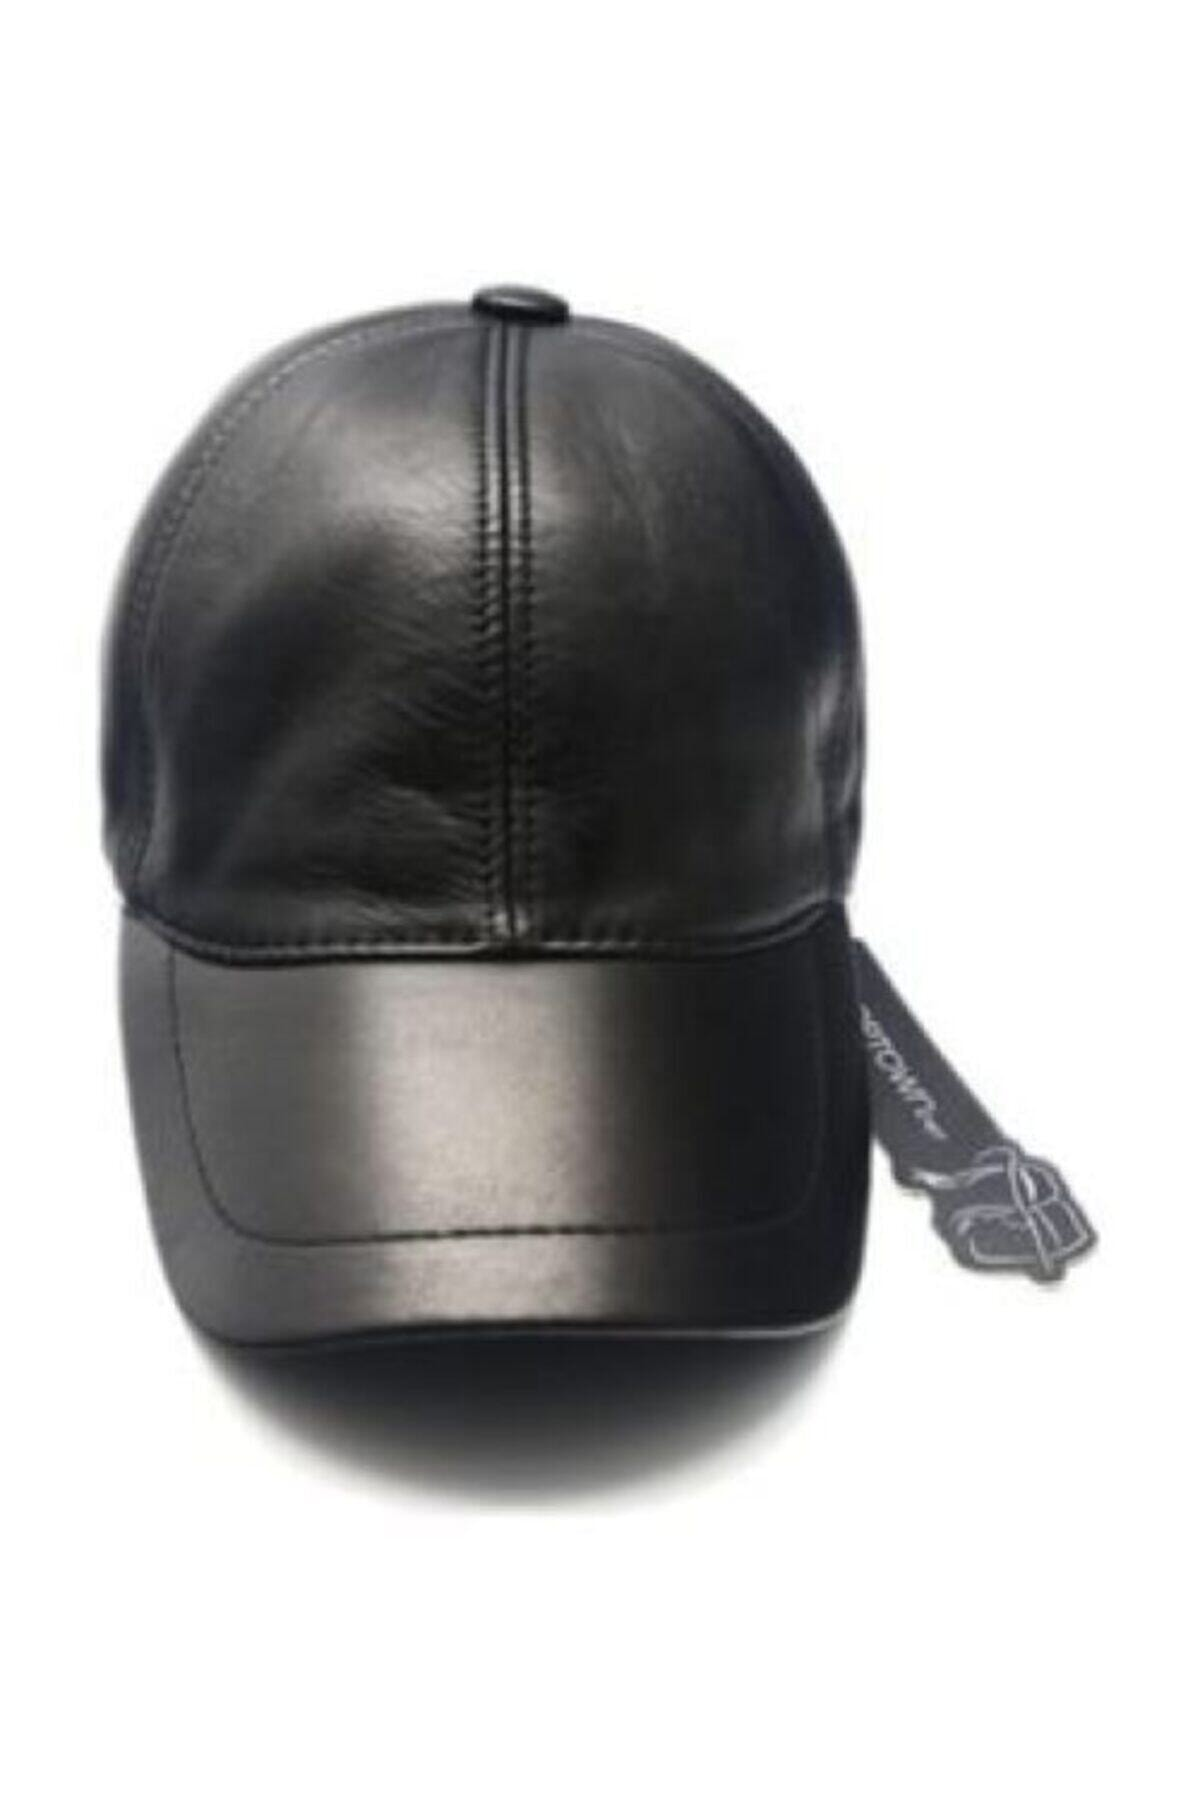 ROTAMZİRVE Unisex Siyah Hakiki Deri Kep Şapka 0004 1